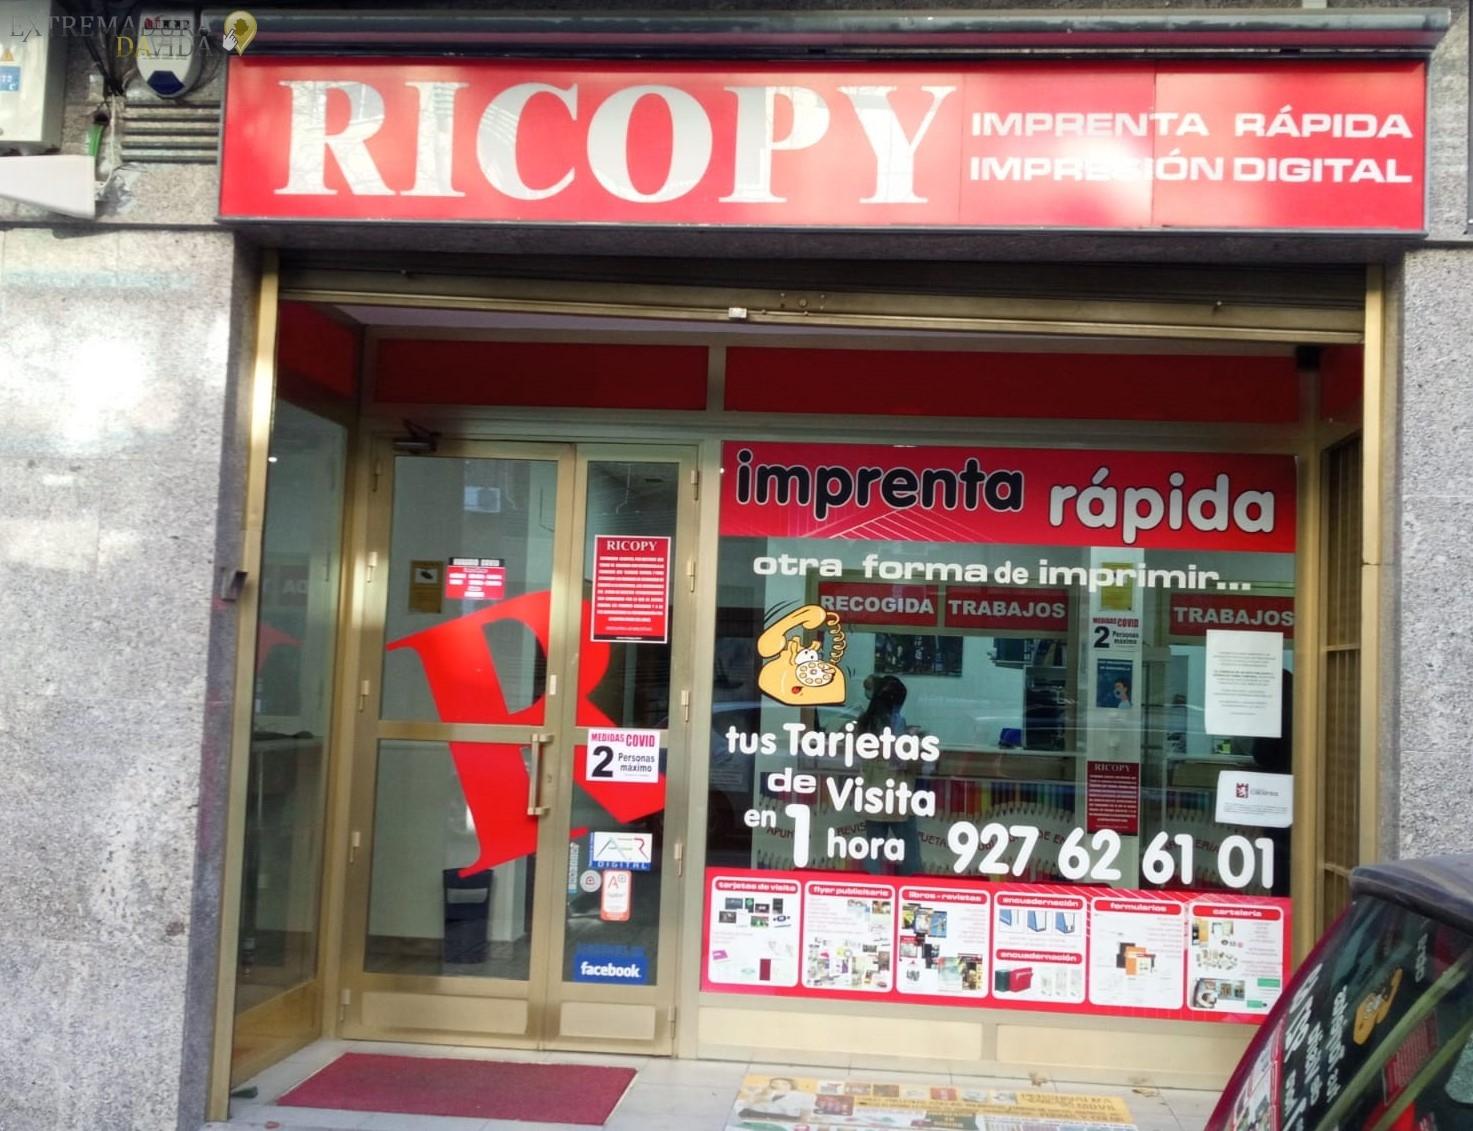 Imprenta en Cáceres Ricopy Copisteria